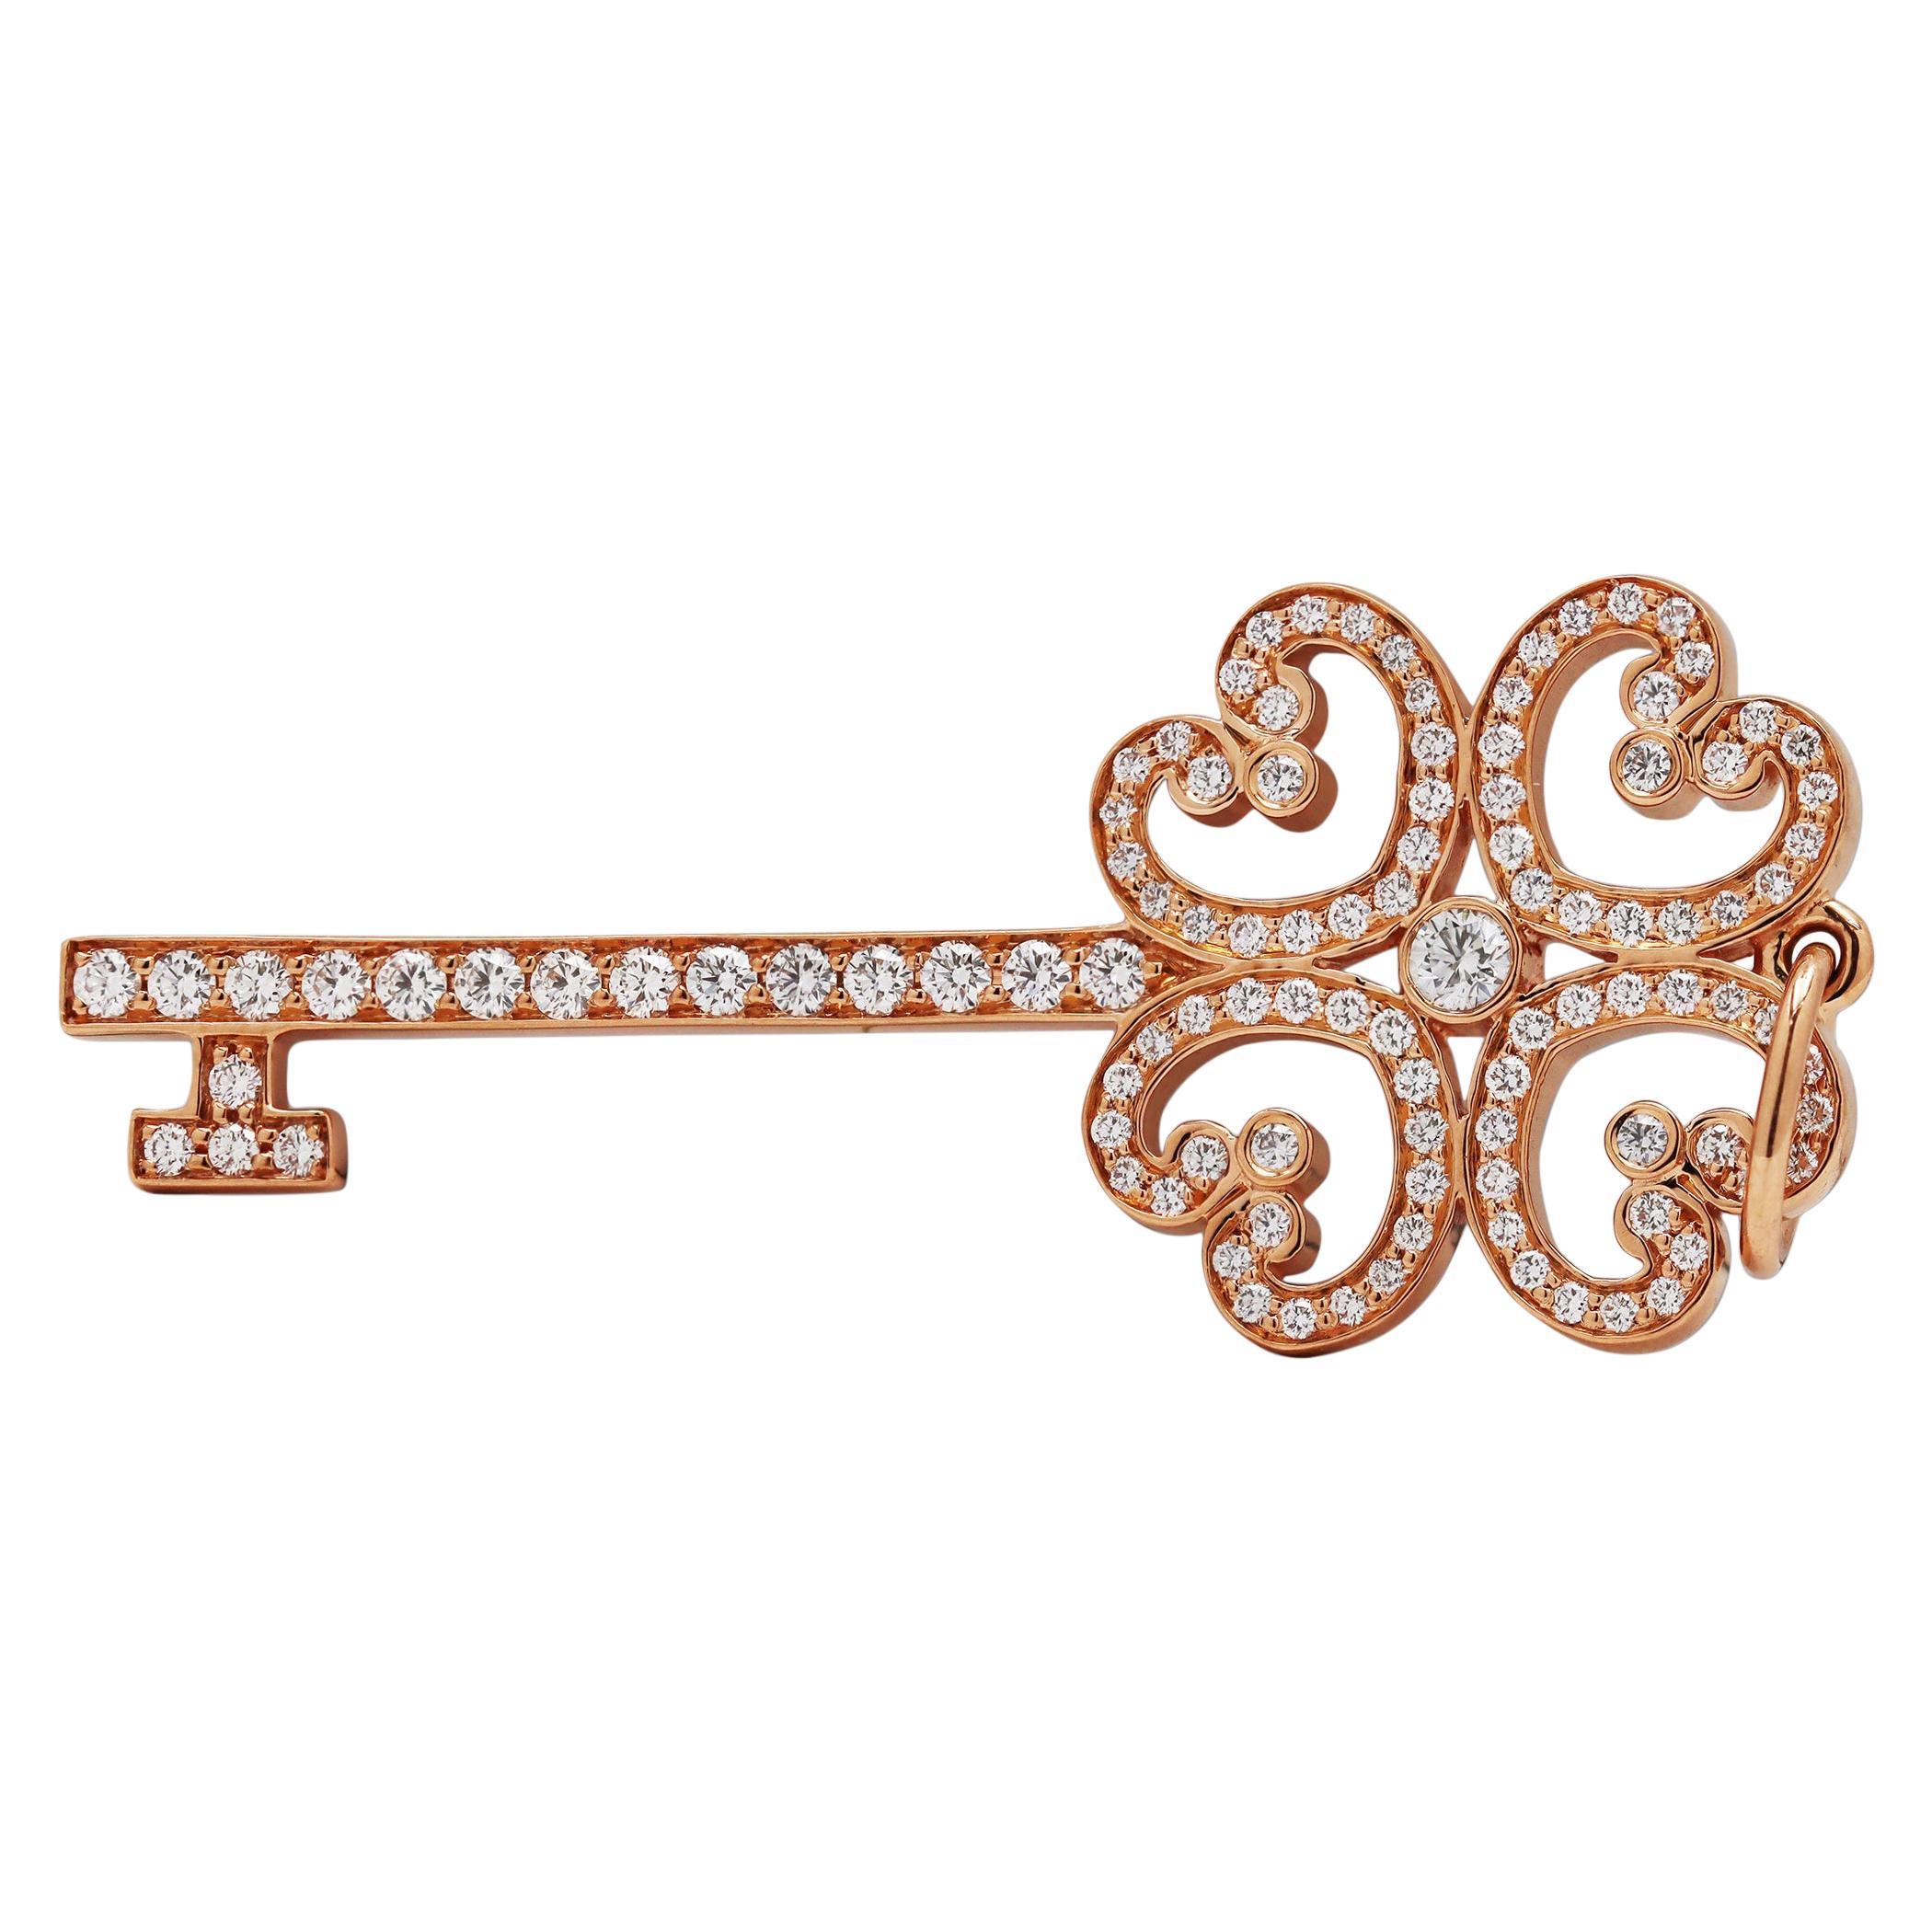 Tiffany & Co. 'Quatra Heart' Rose Gold Diamond Key Pendant